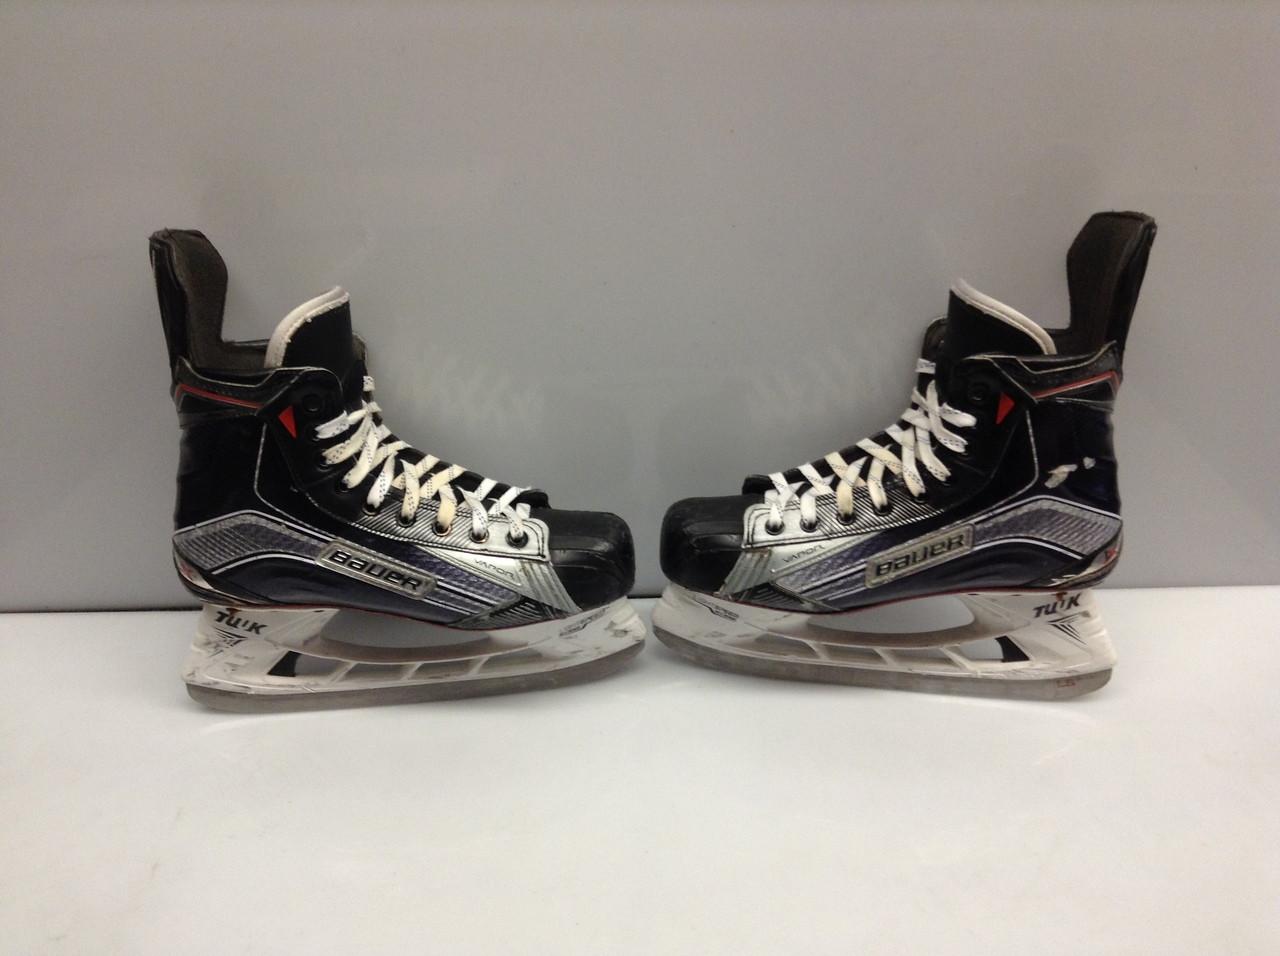 Used Hockey Skates >> Bauer Vapor 1x Custom Pro Stock Ice Hockey Skates 7 75 E Used Hartford Wolfpack Custom Ahl